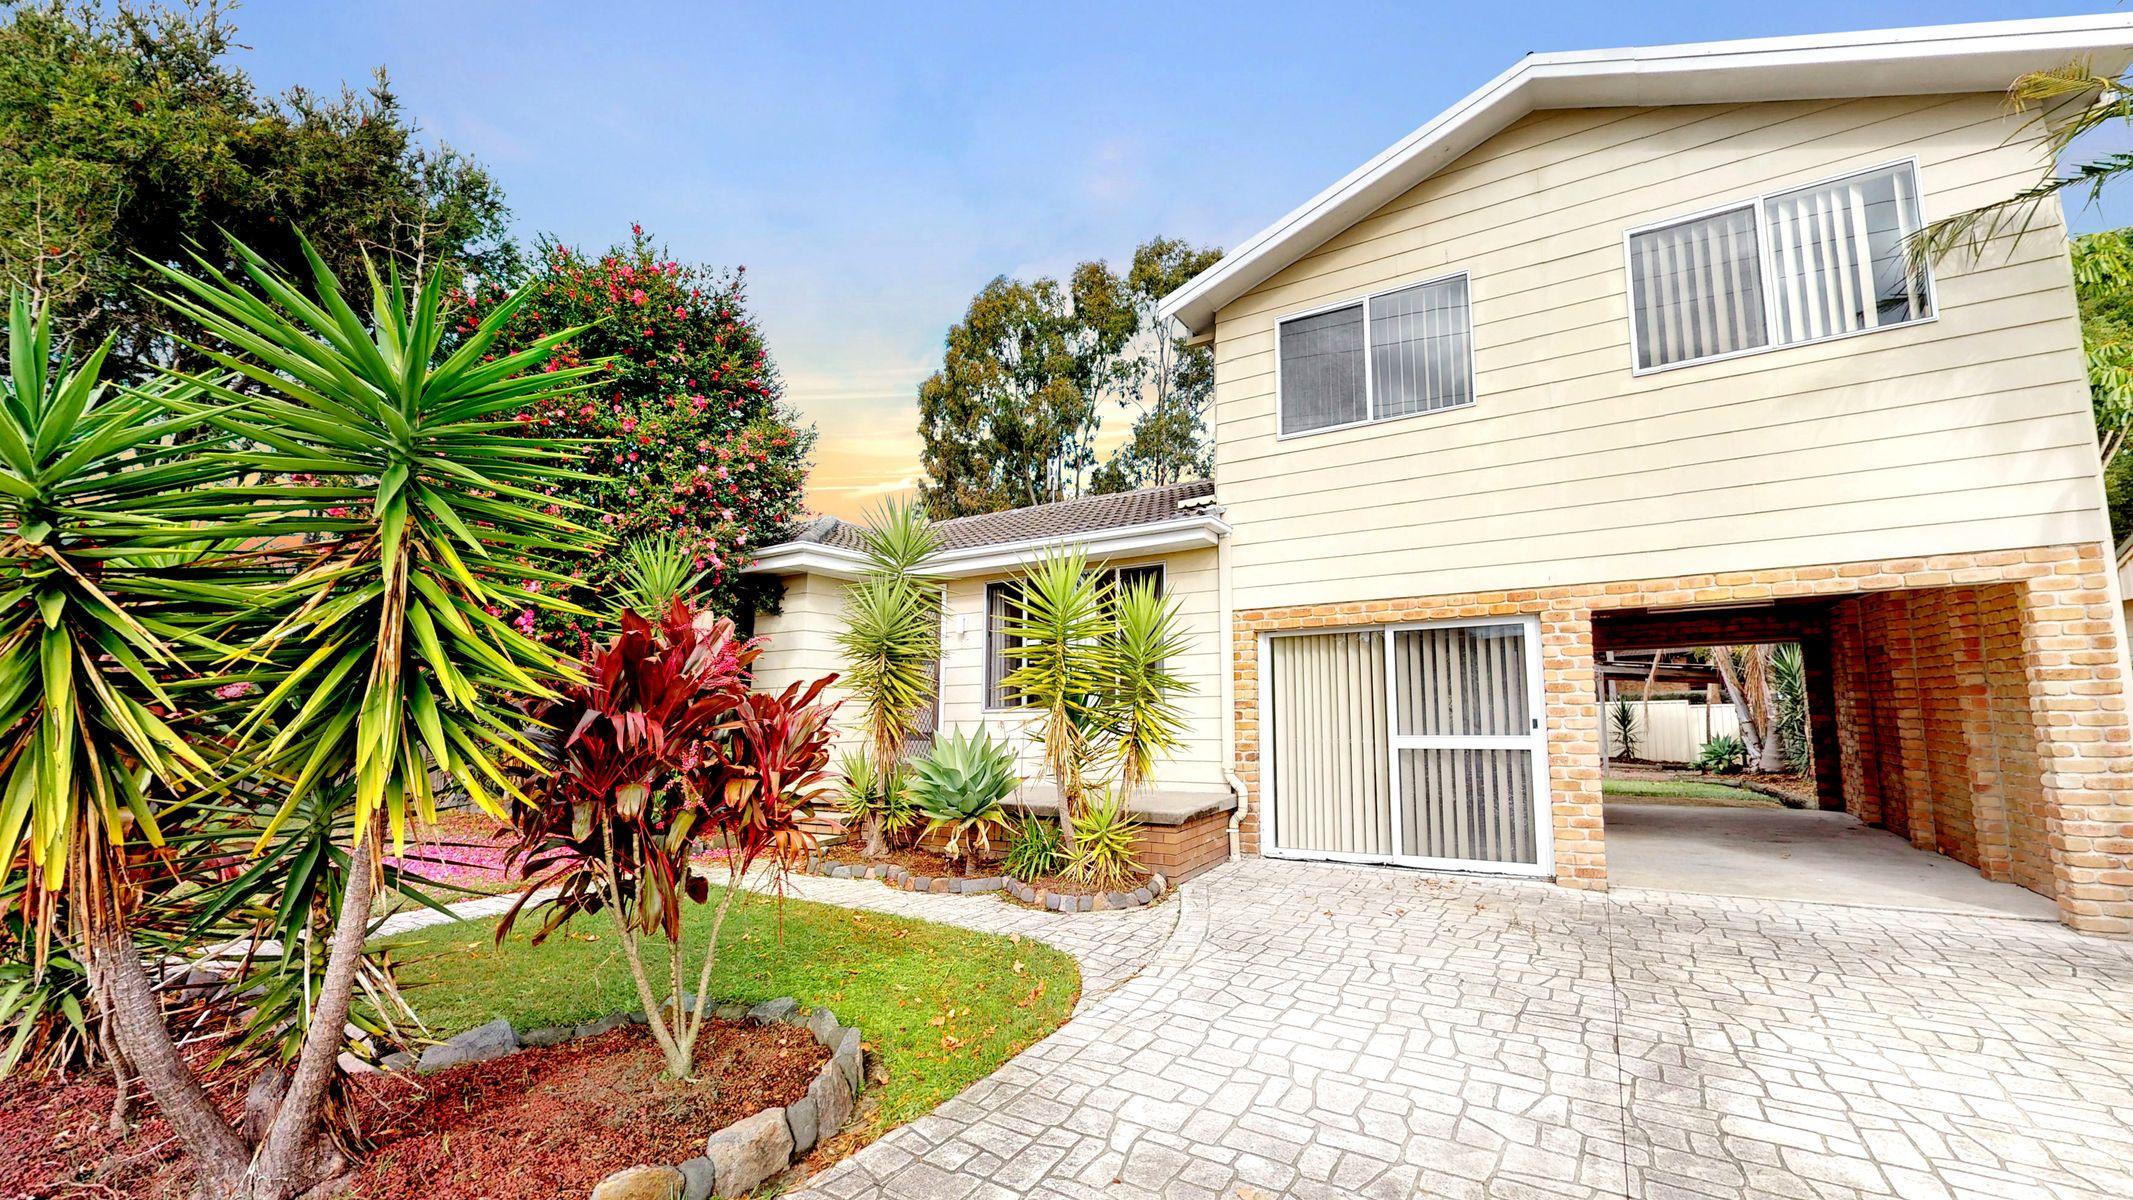 37 East St, Warners Bay NSW 2282, Australia, House for Lease